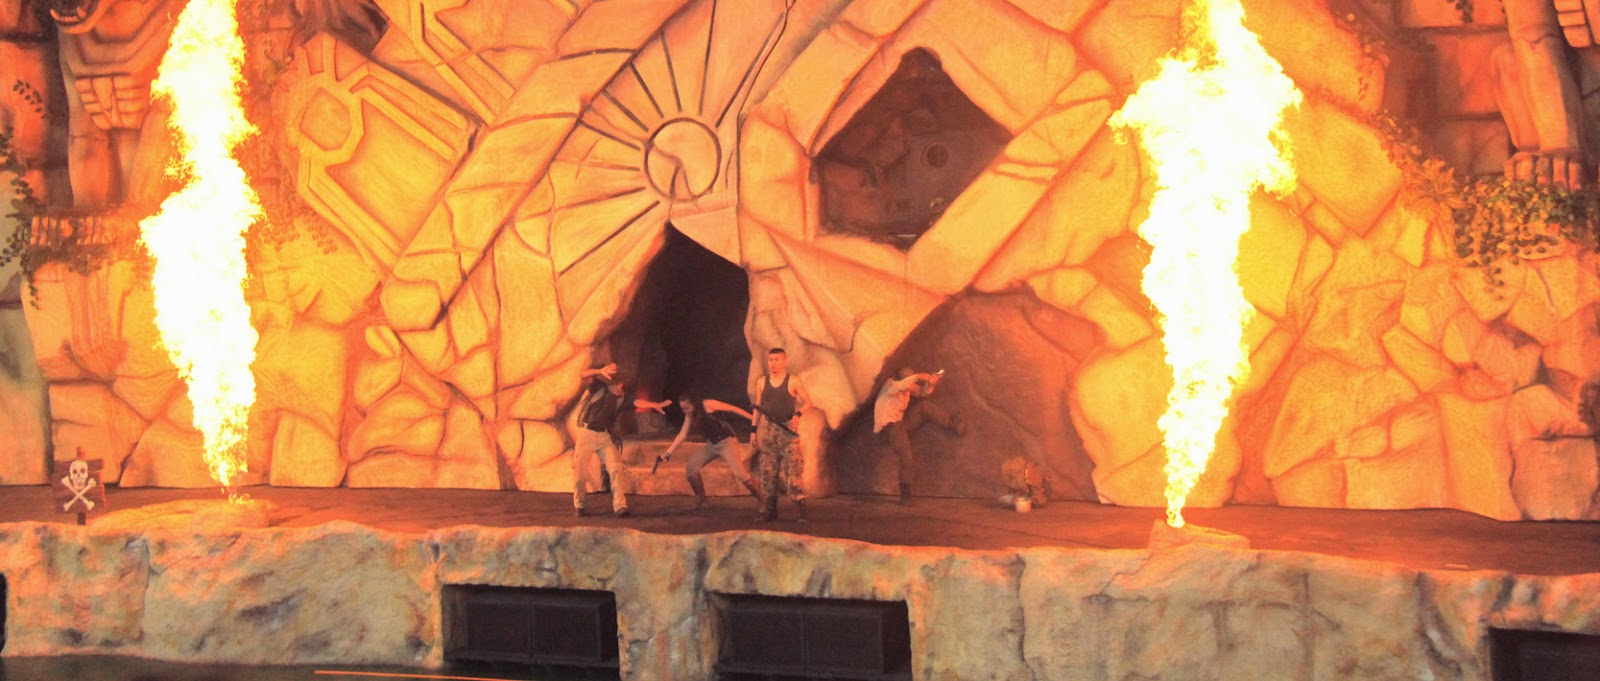 Treasureland Temple Of Fire